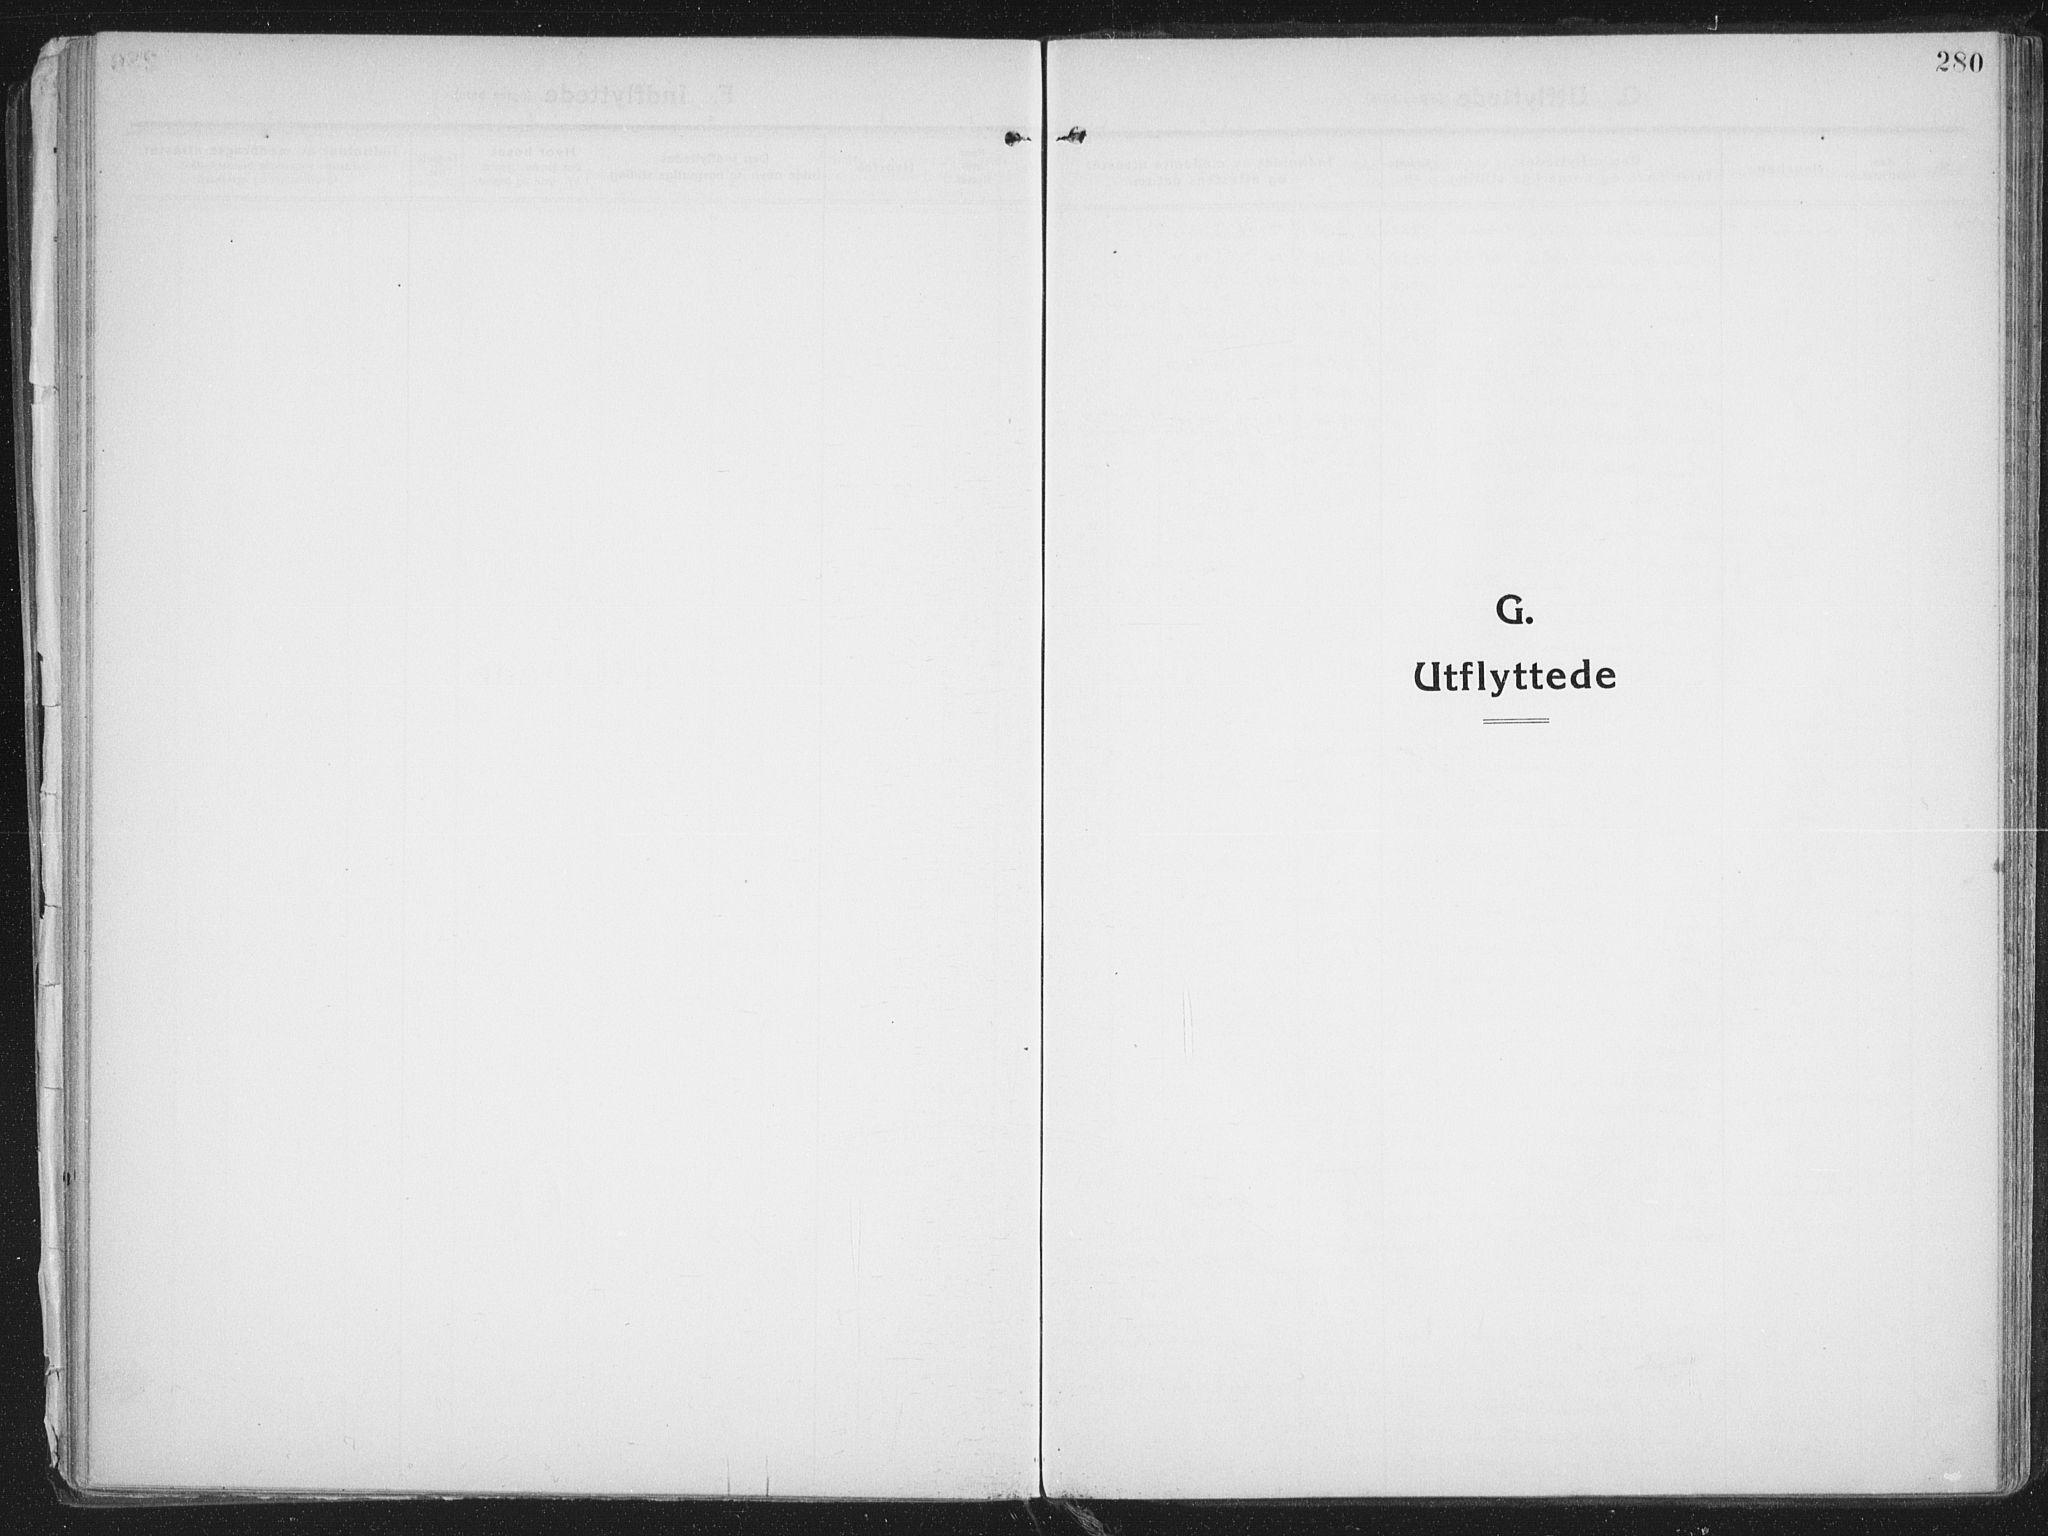 SATØ, Lenvik sokneprestembete, H/Ha: Ministerialbok nr. 16, 1910-1924, s. 280